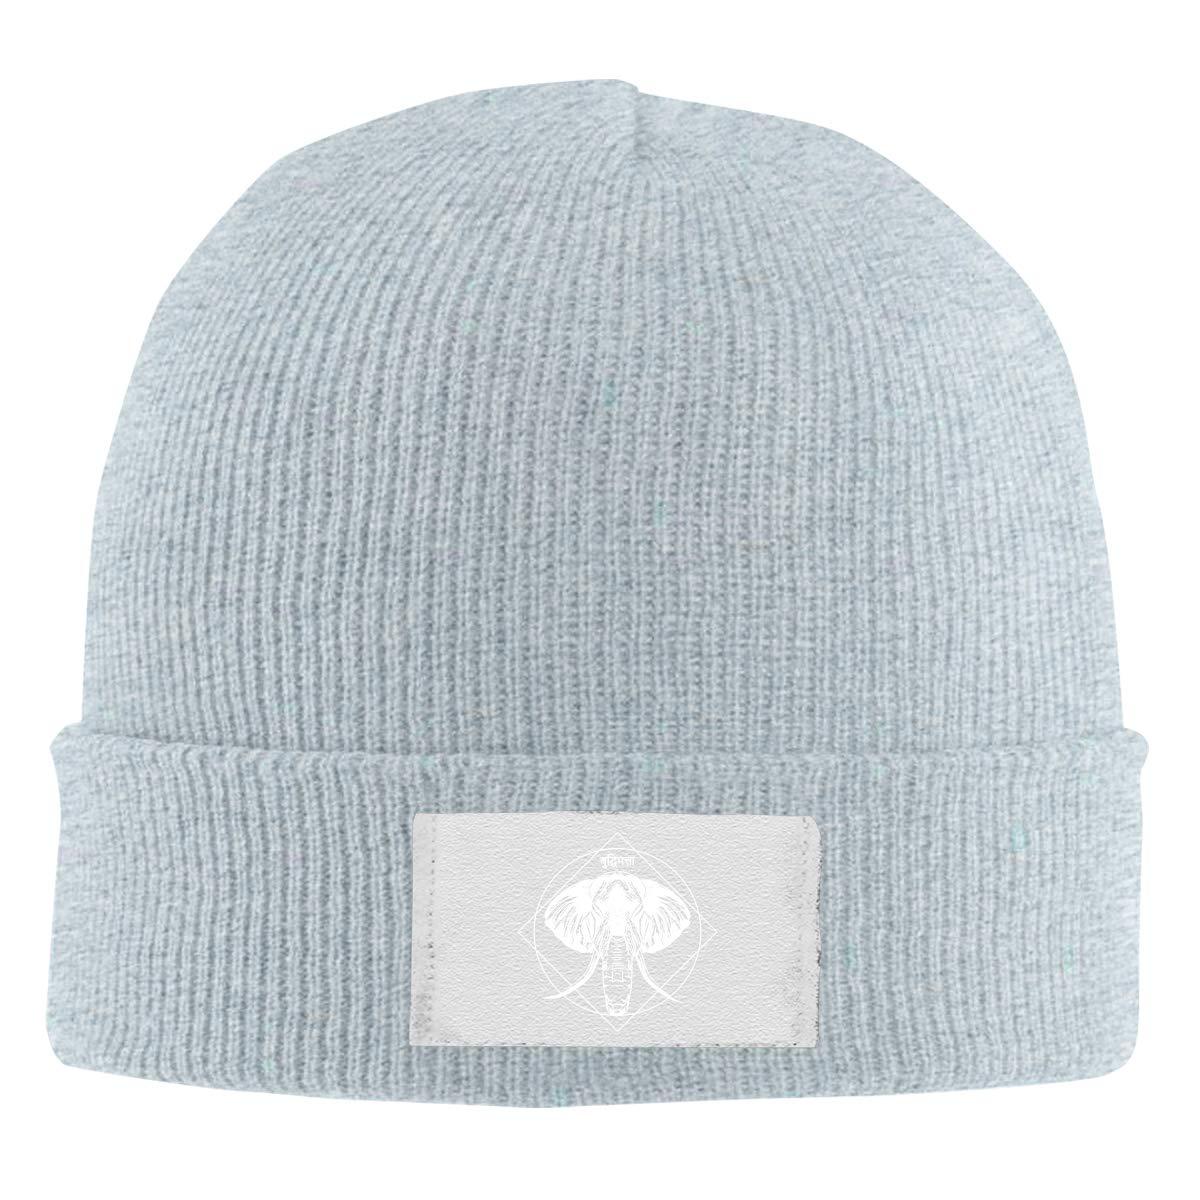 Stretchy Cuff Beanie Hat Black Dunpaiaa Skull Caps Alpha Male Winter Warm Knit Hats